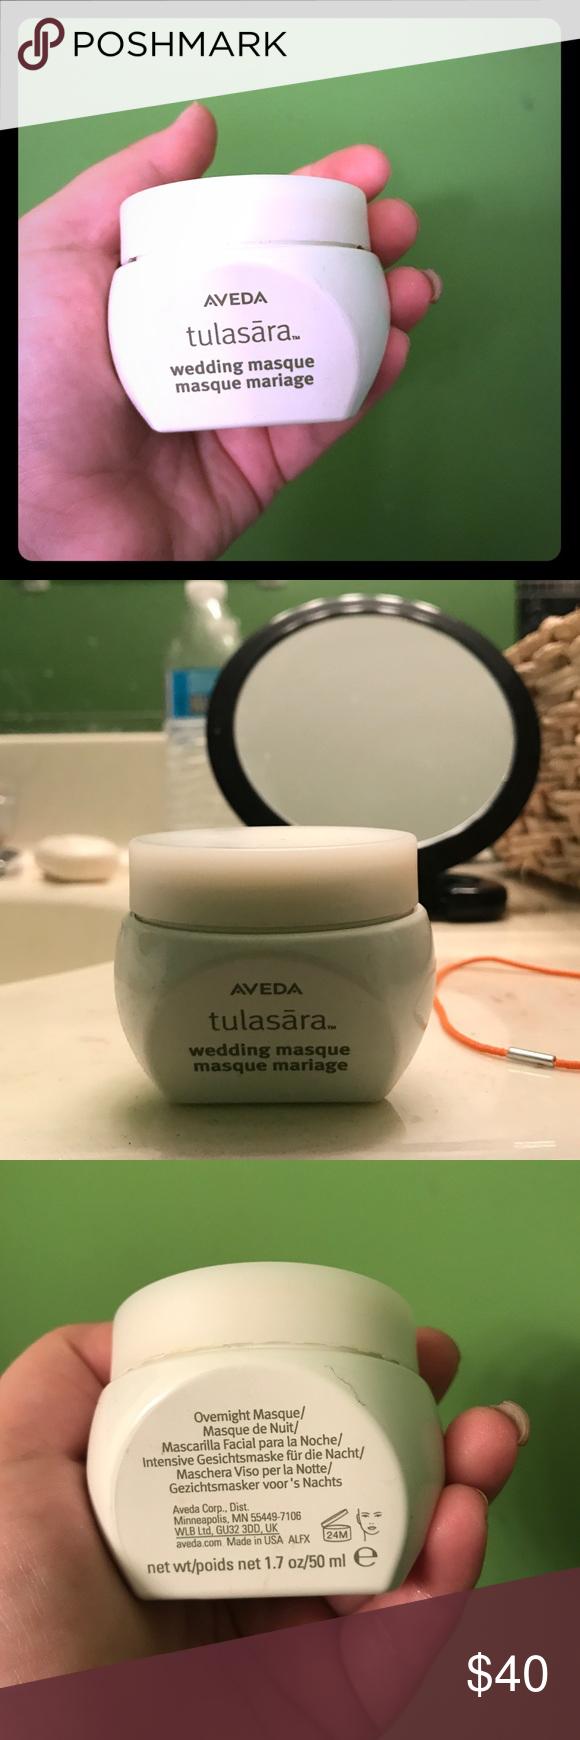 Aveda Tulasara Wedding Masque An awesome night cream! Uses